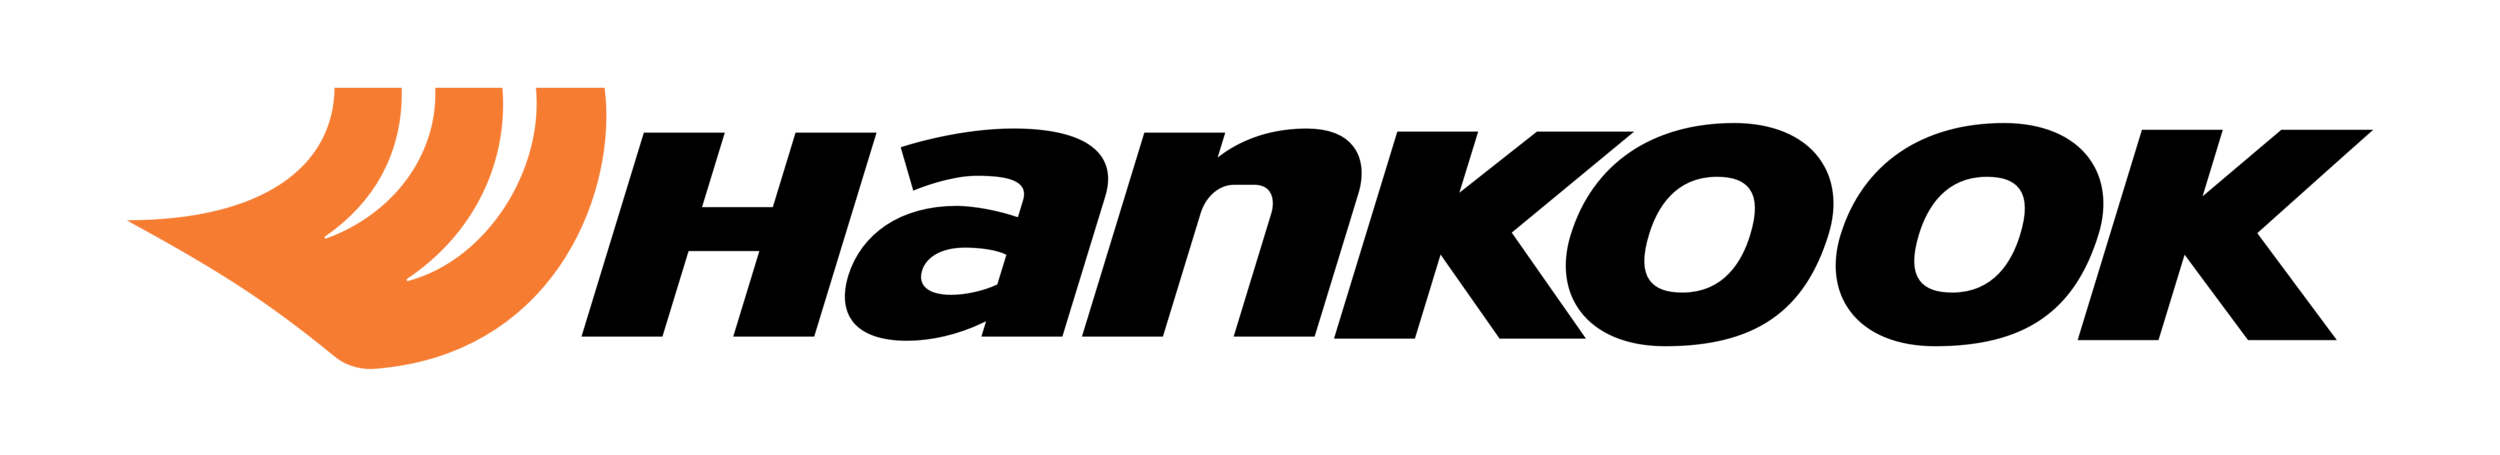 Hankook-logo-5500x1000.png